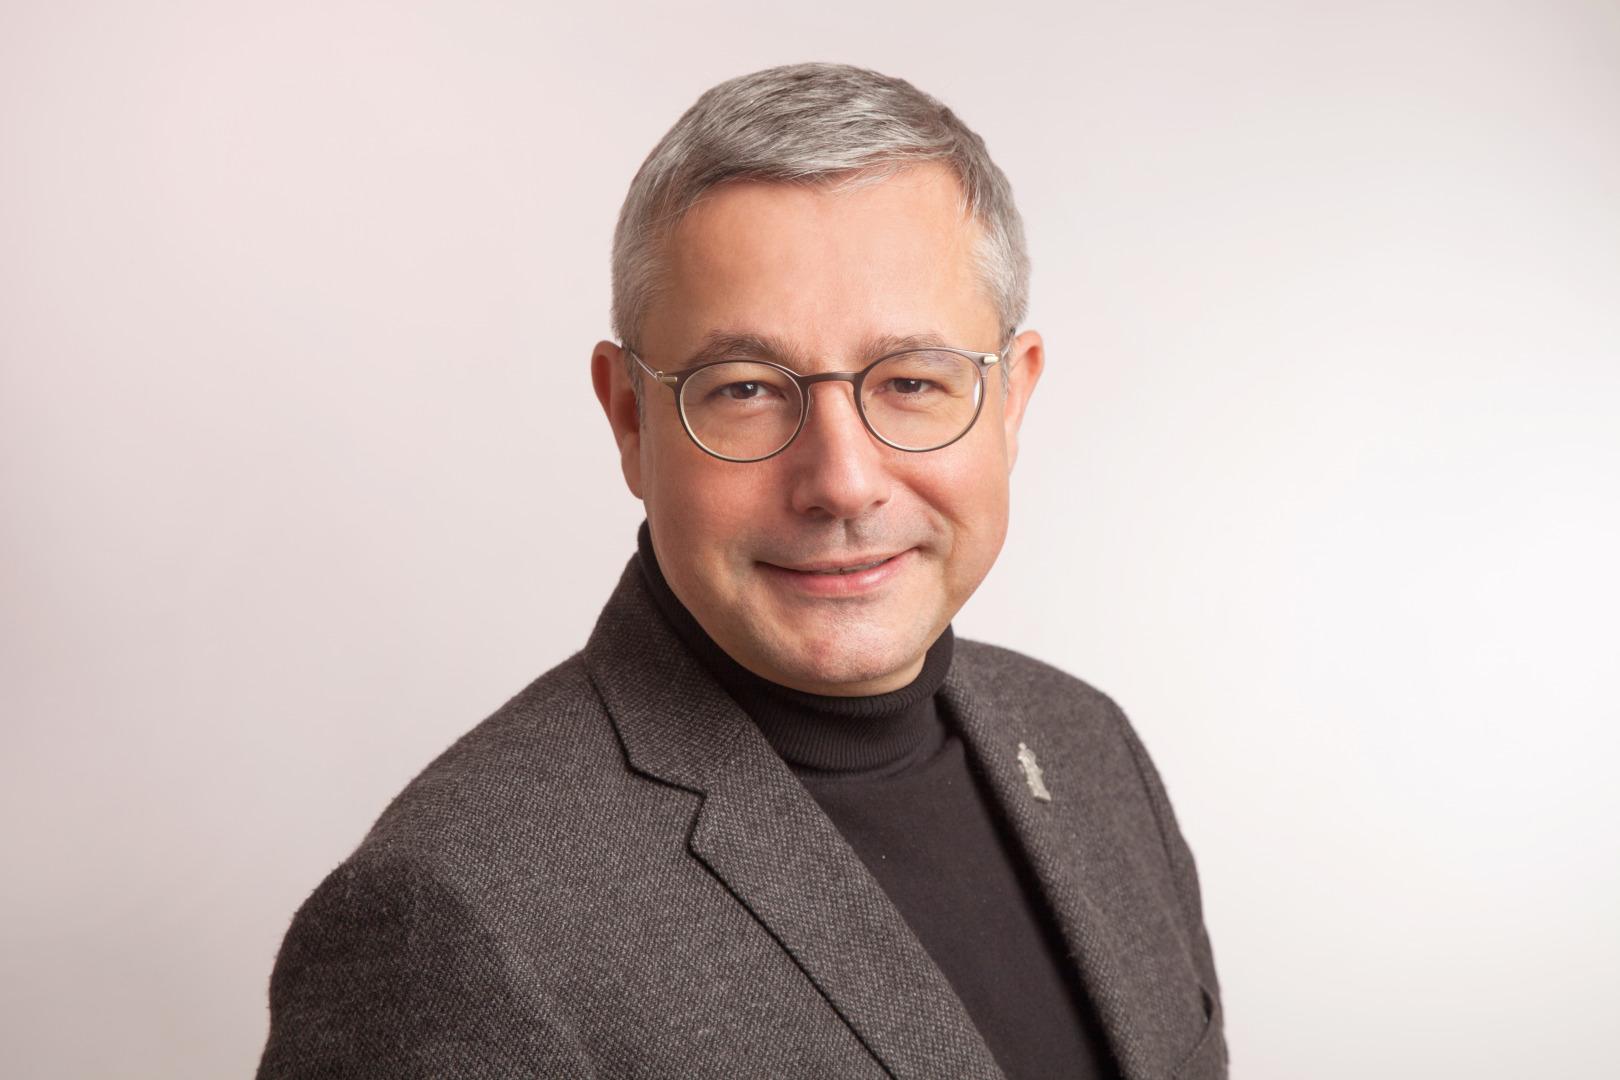 André Knapp